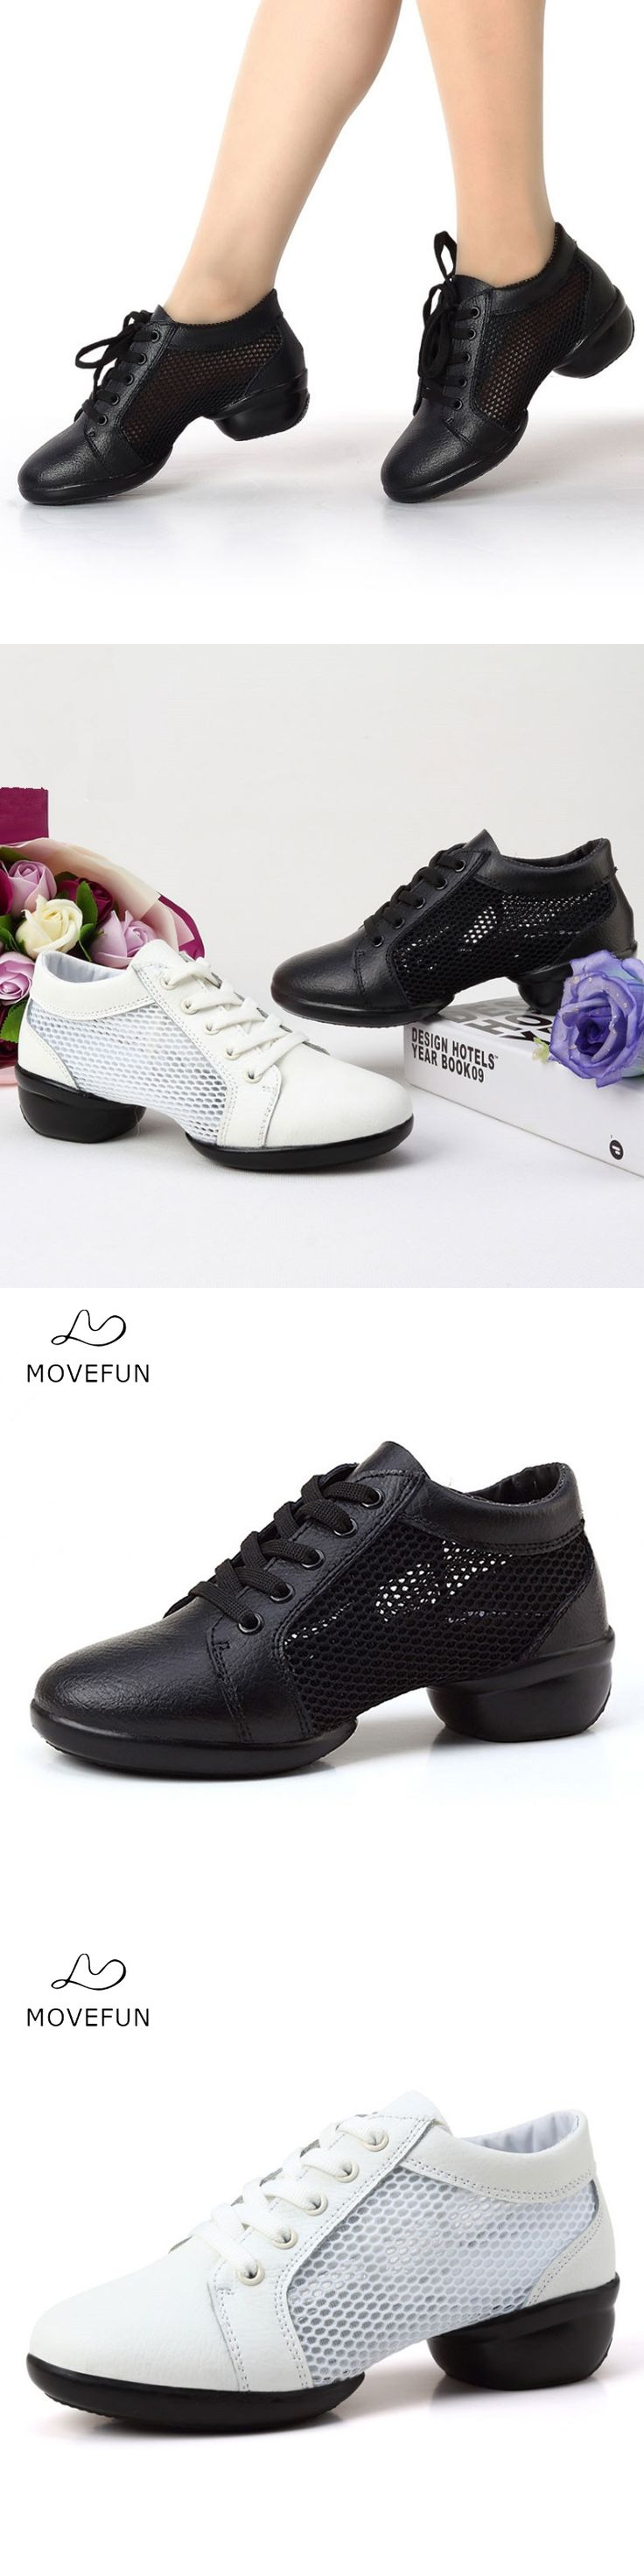 MoveFun 2017 Breath Dance Sneakers Jazz Shoes Women Girls Soft Outsole Dancing Shoe Teachers Fitness Square Dance Shoes Woman-43